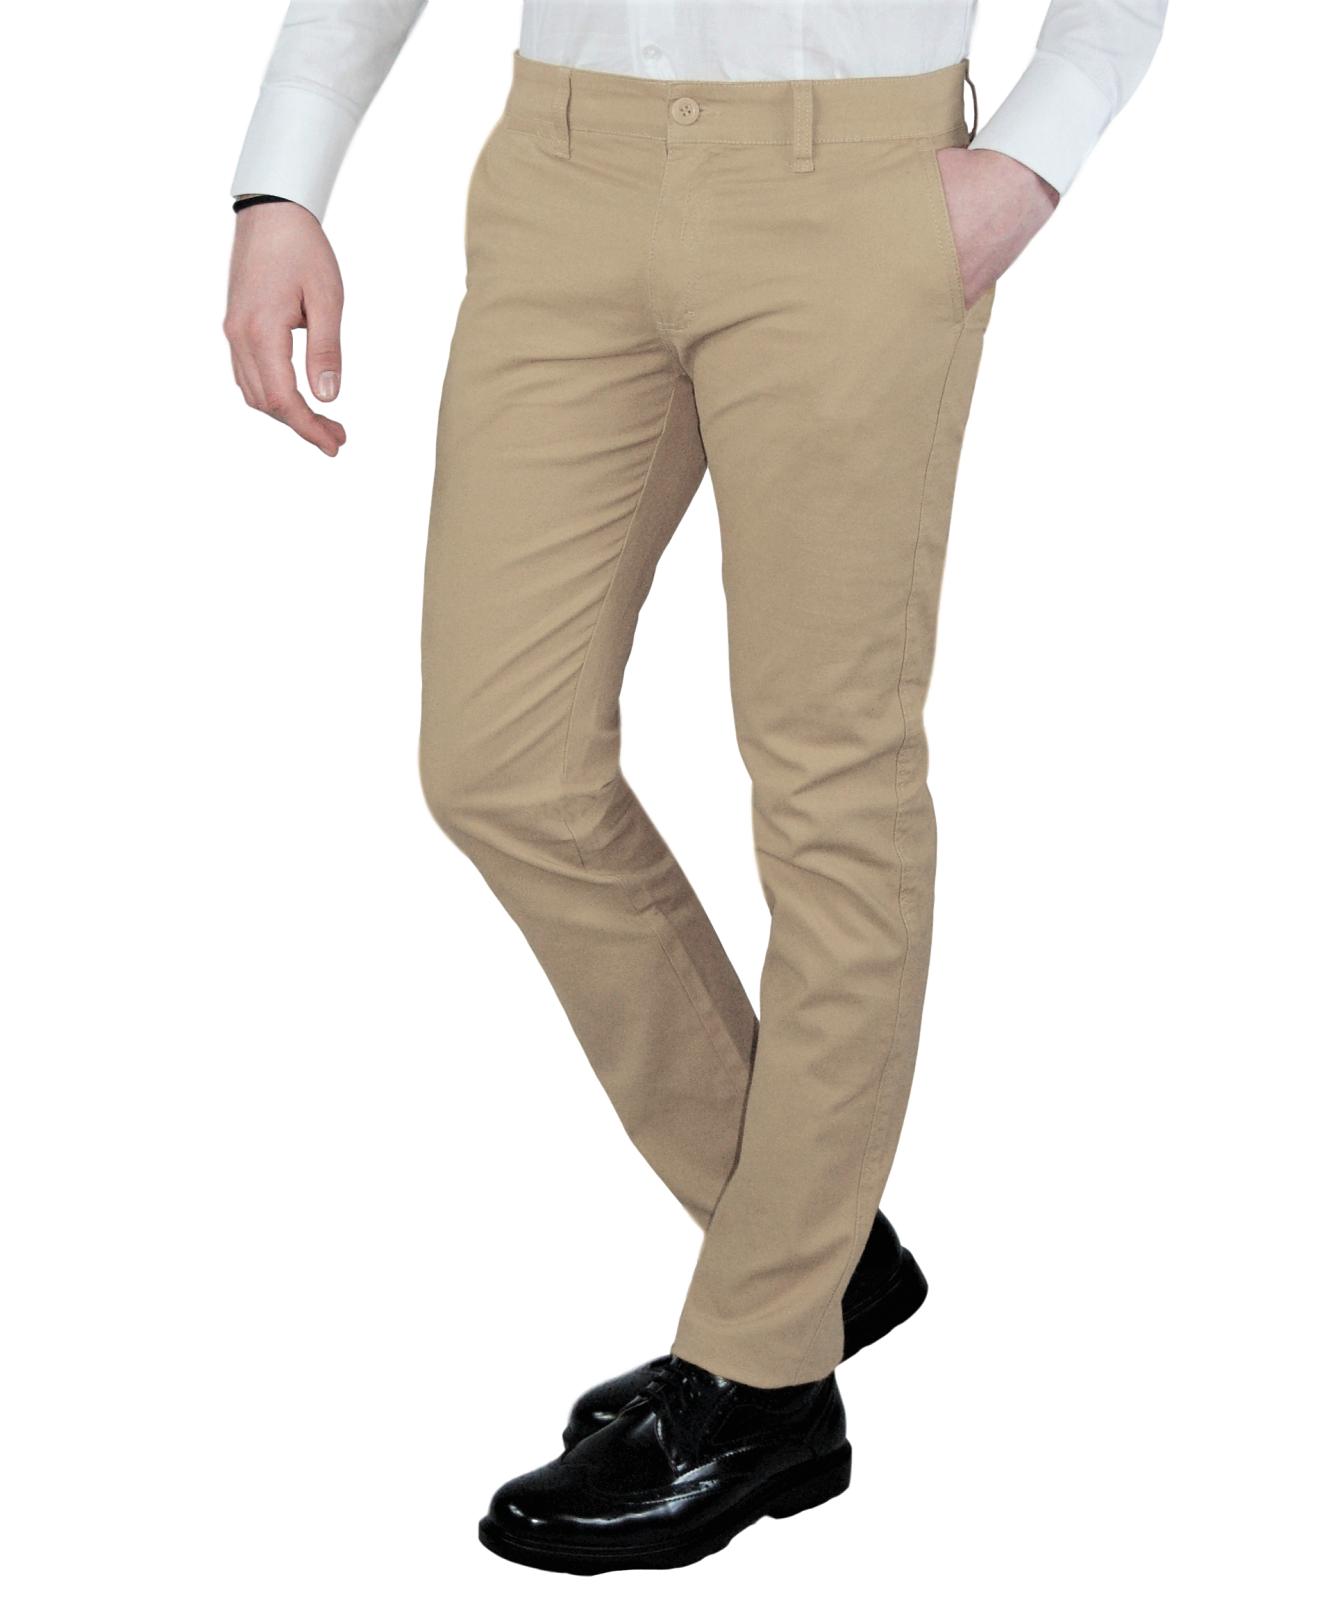 Pantalone-Uomo-Chino-Slim-fit-Primaverile-tasca-america-Bianco-Grigio-Senape-Bei miniatura 28